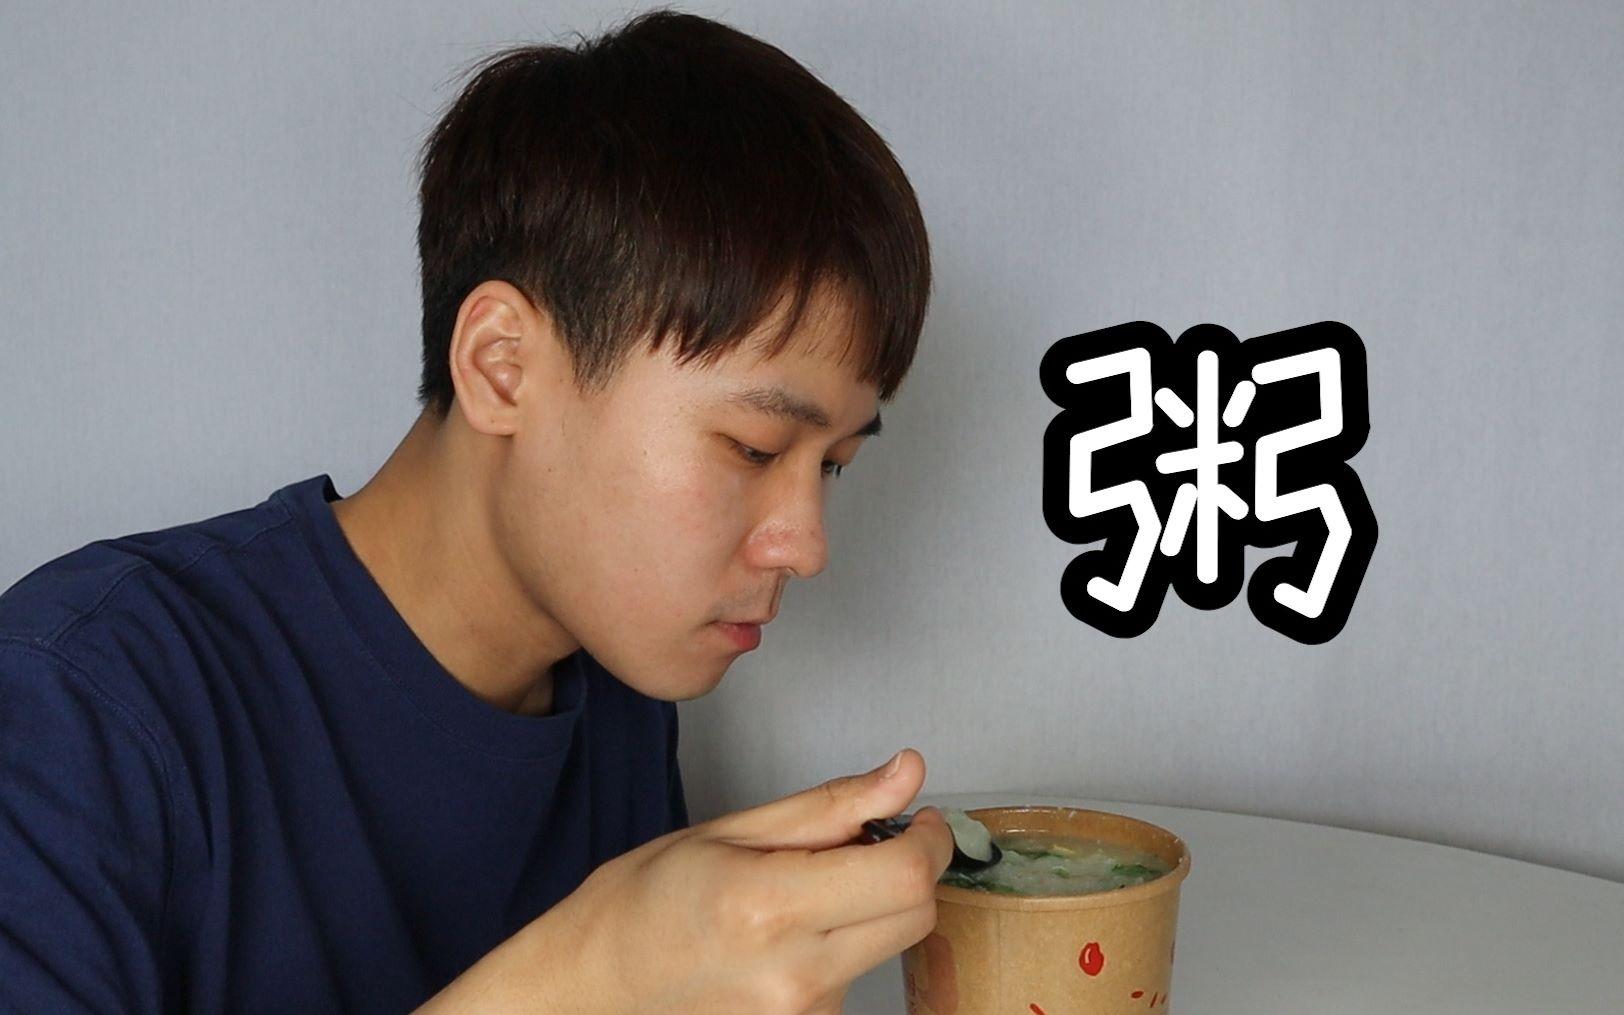 中國人喝粥的時候,韓國人一定會說的話是...?!_嗶哩嗶哩 (゜-゜)つロ 干杯~-bilibili